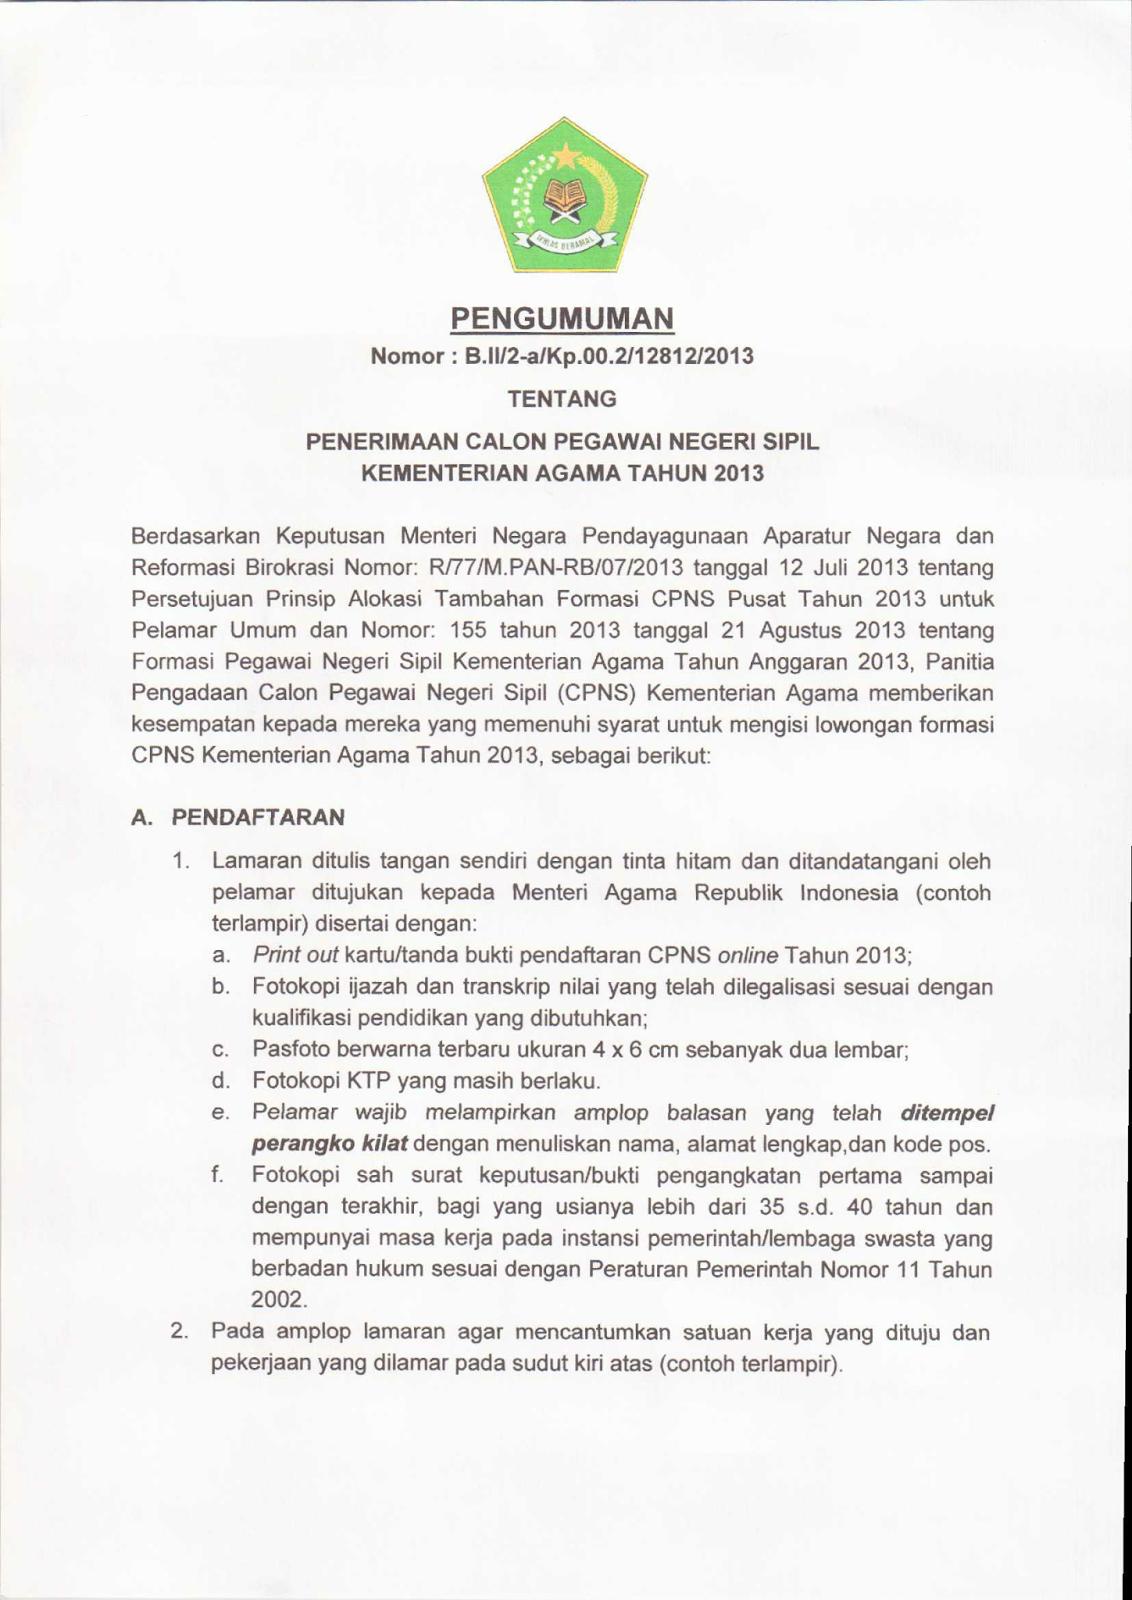 Related image with Cara Pendaftaran Online Cpns Di Panselnasmenpangoid